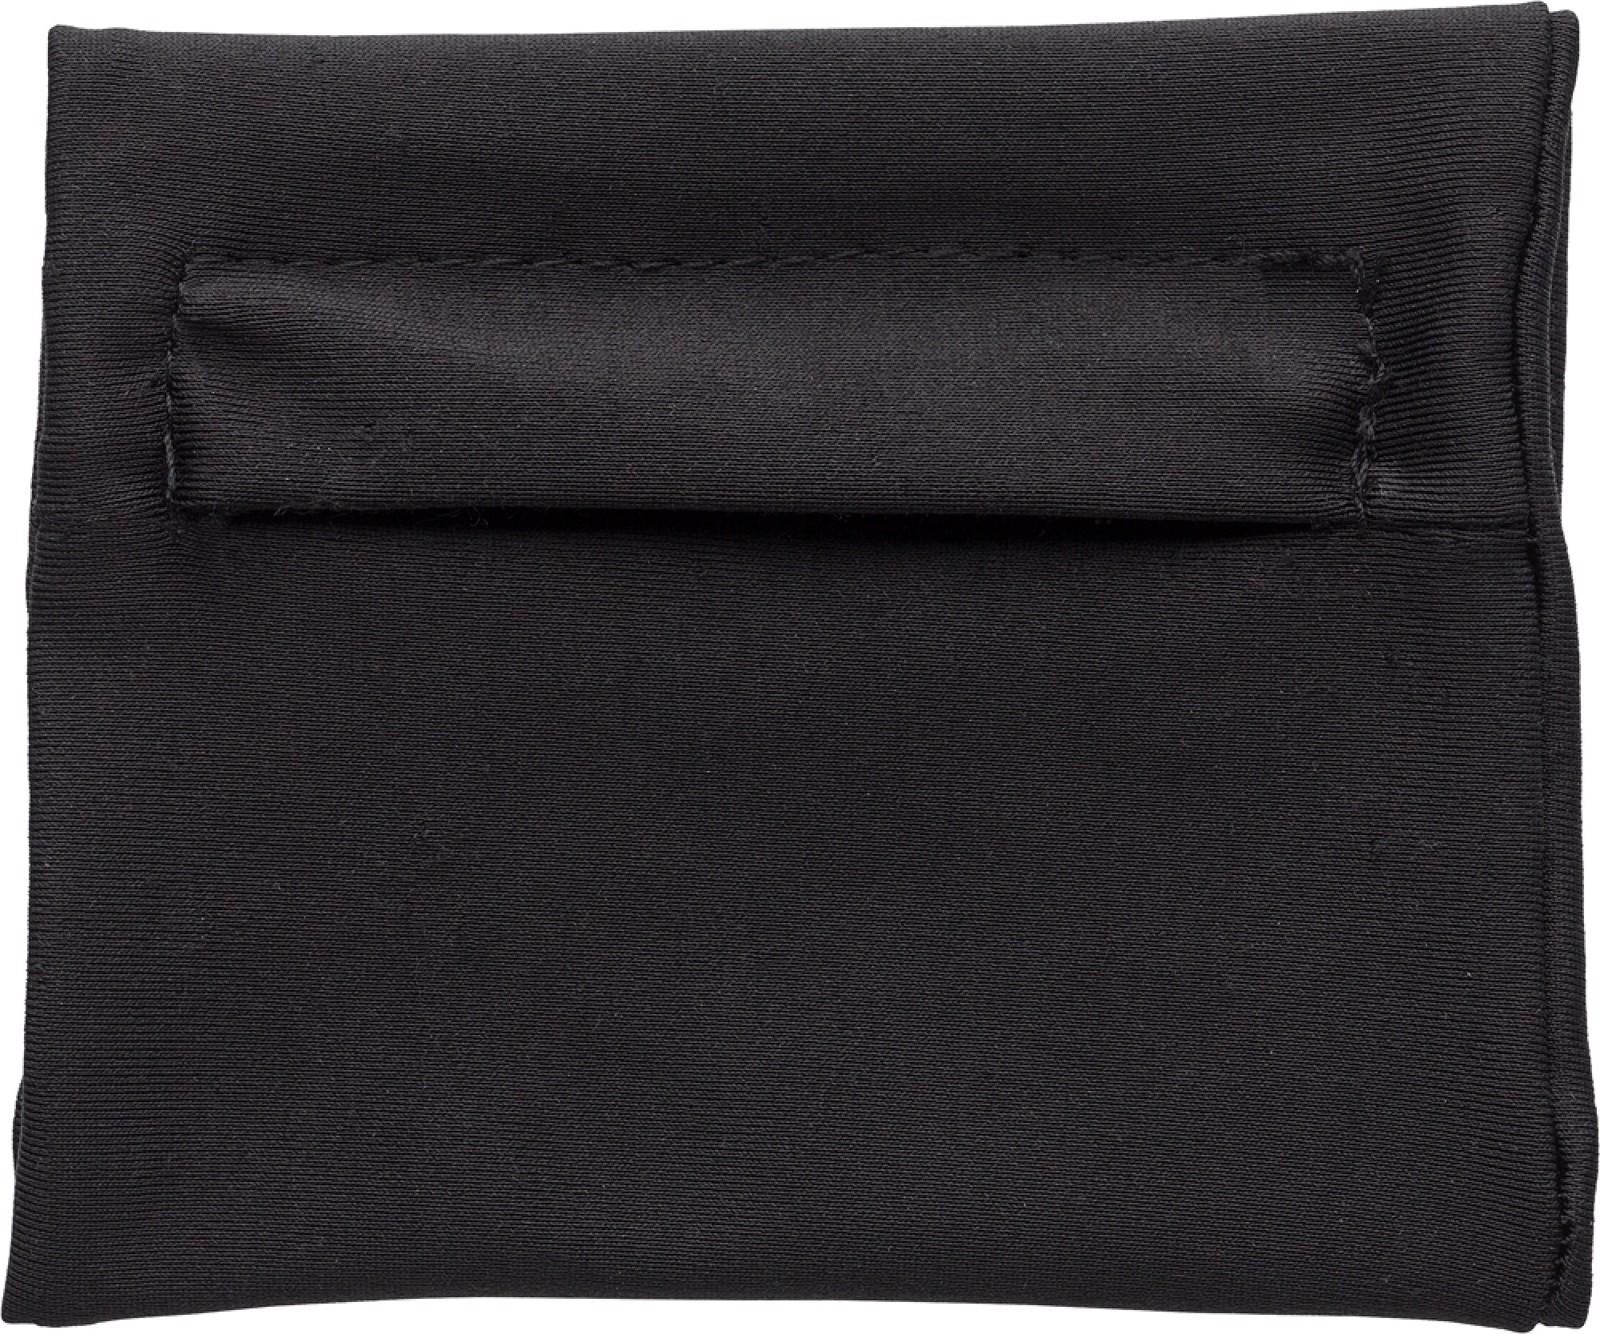 Polyester (200 gr/m²) wrist wallet - Black